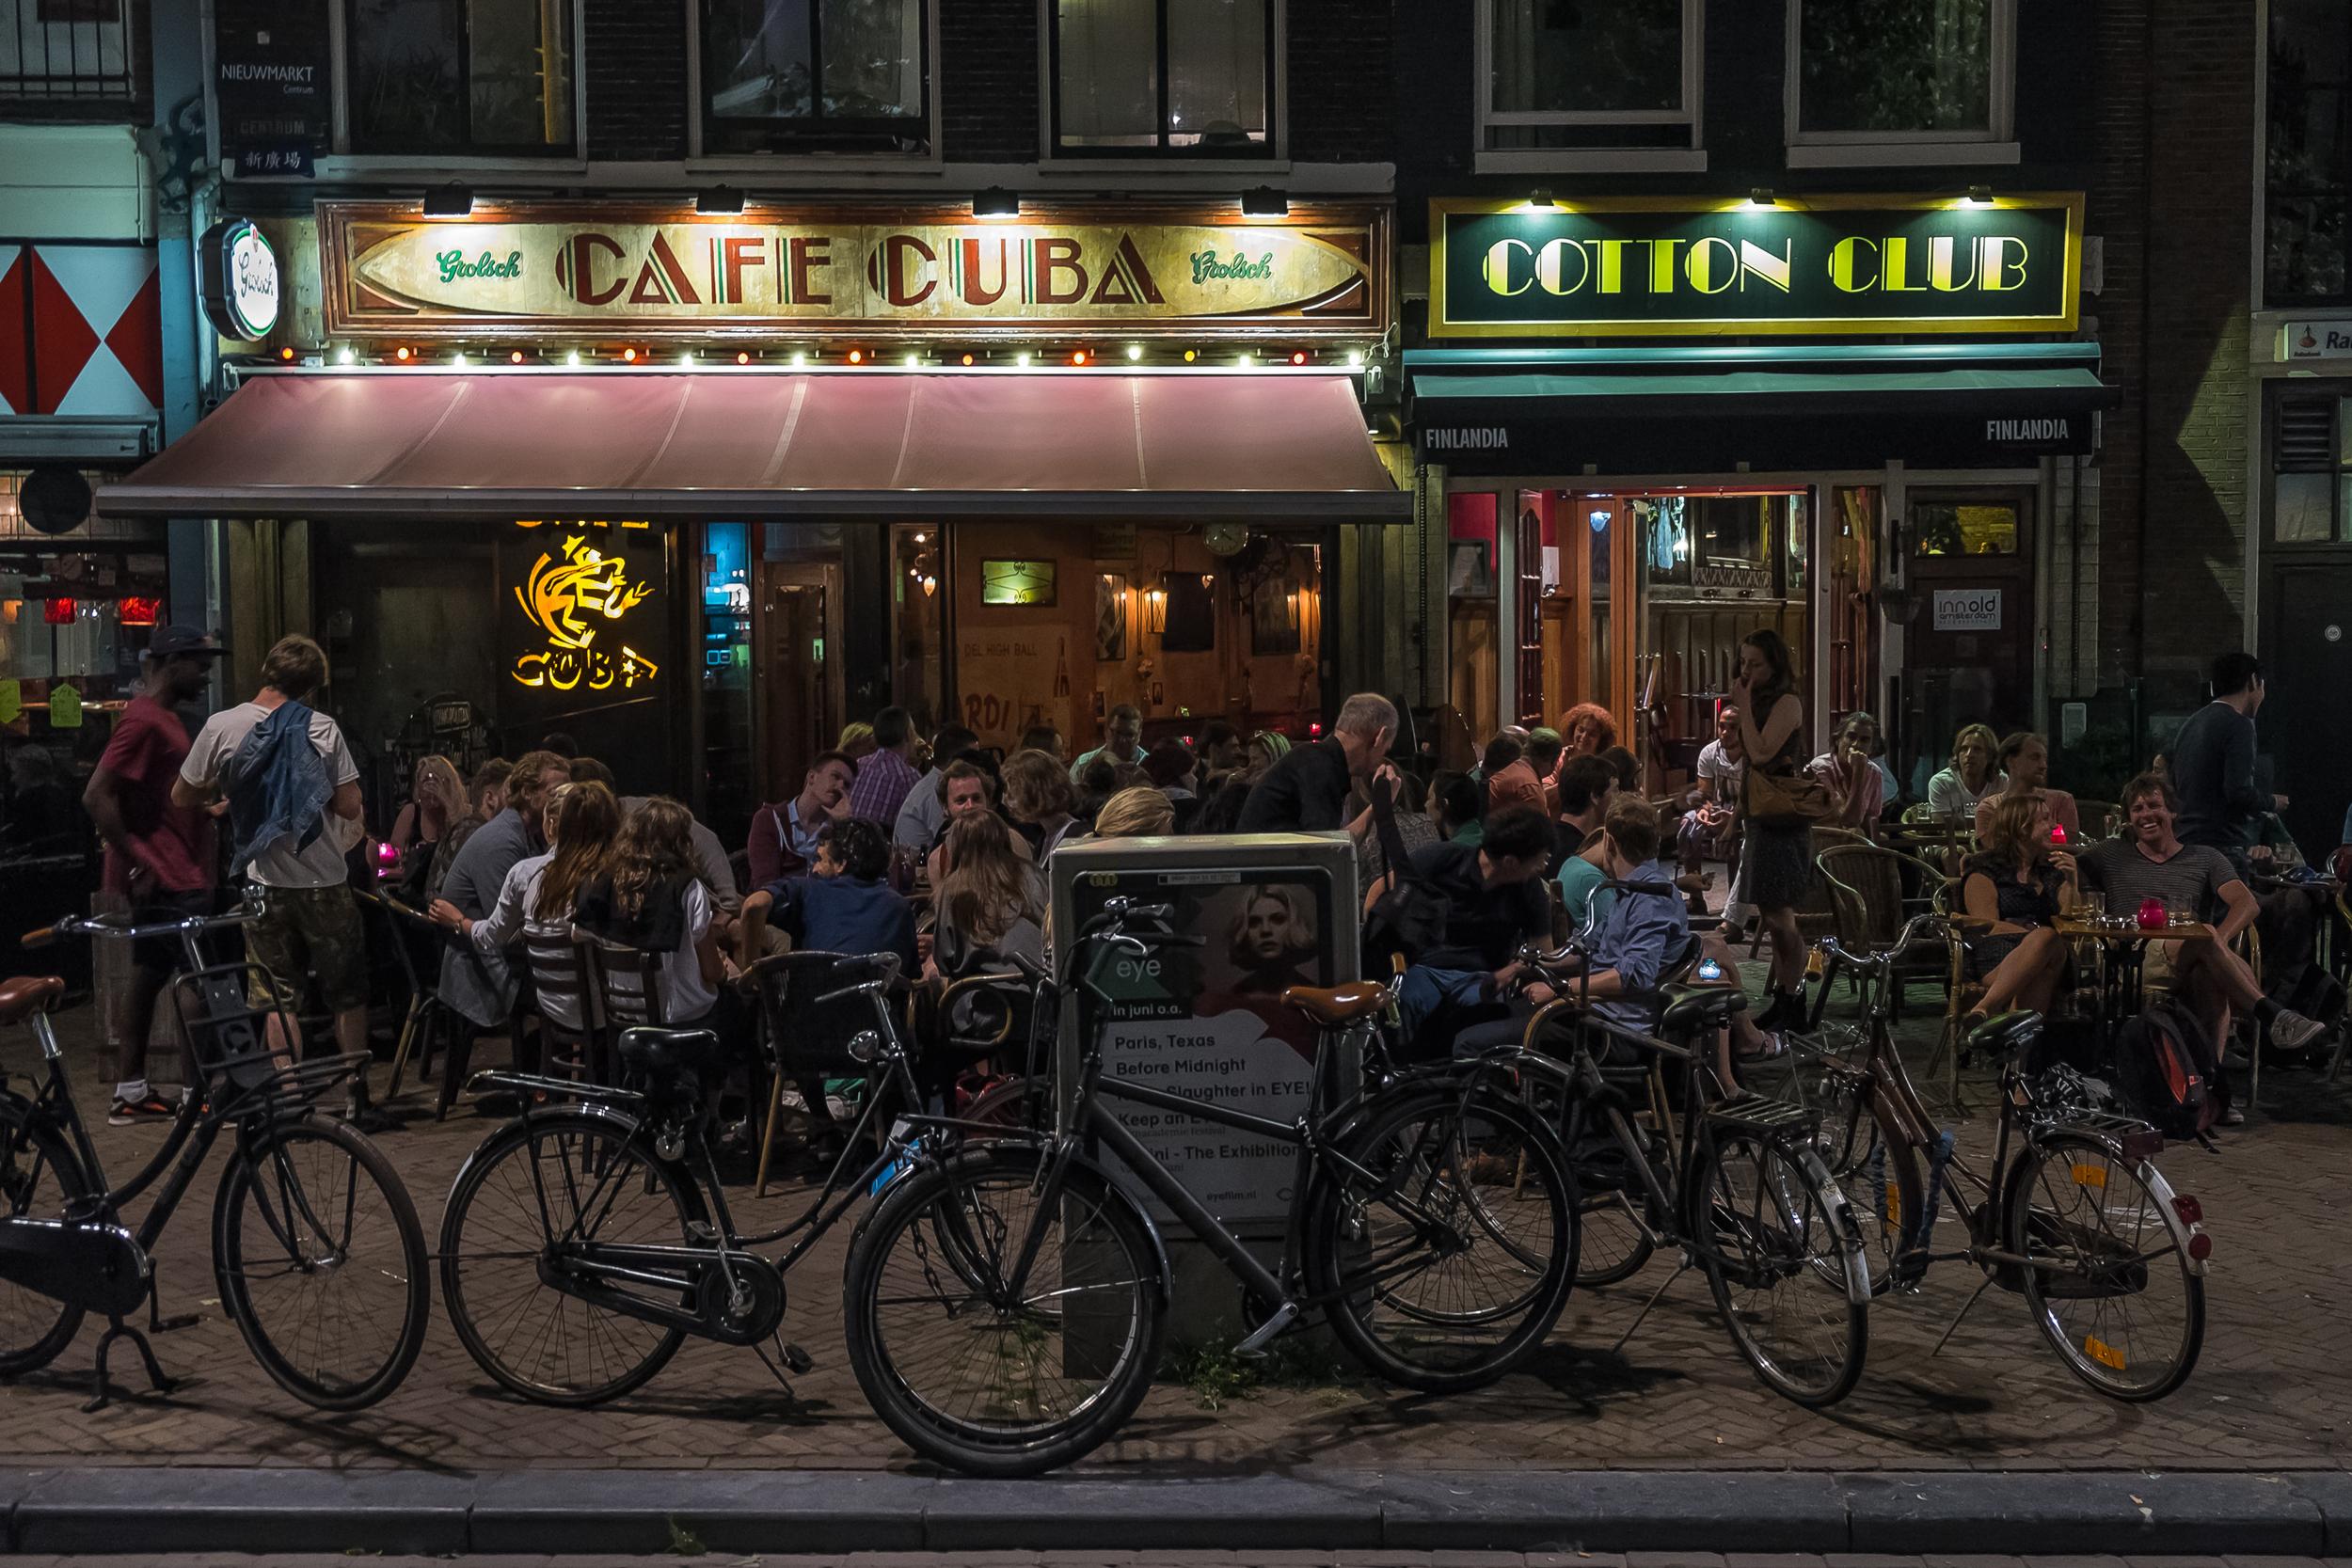 Amsterdam-CafeCubaCottonClub-20130618 20130618-DSCF0712.jpg